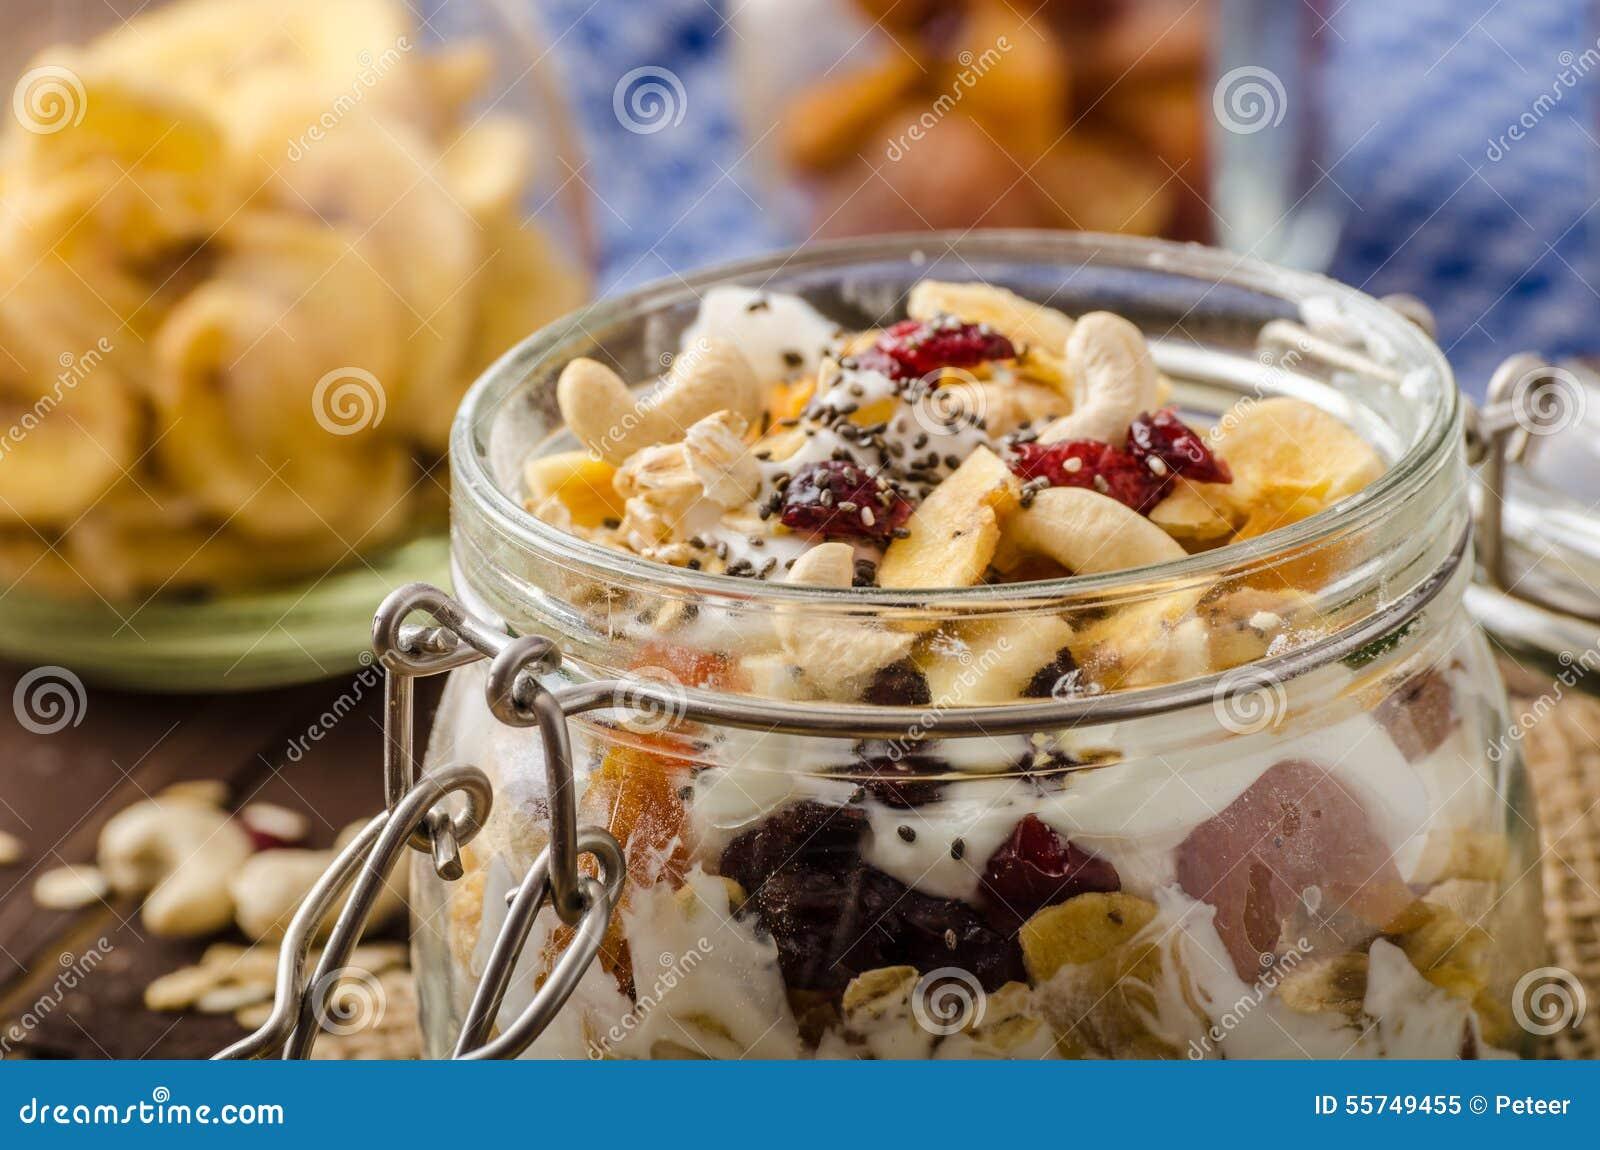 Homemade Yogurt With Granola, Dried Fruit And Nuts Bio ...